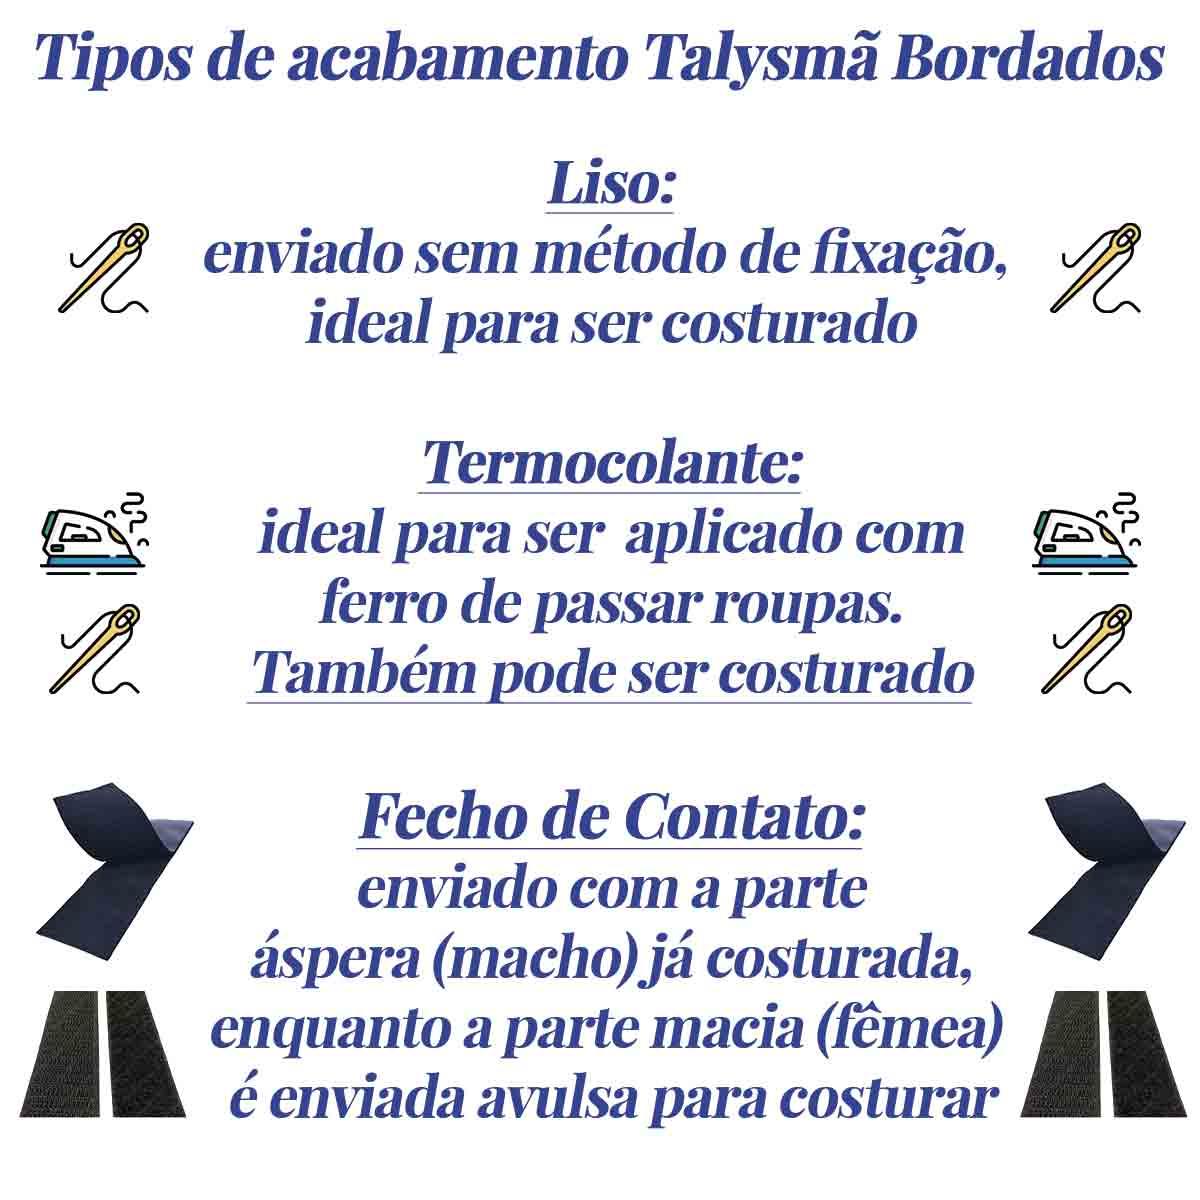 Patch Bordado - Bandeira Brasil BD50015-34G  - Talysmã Bordados